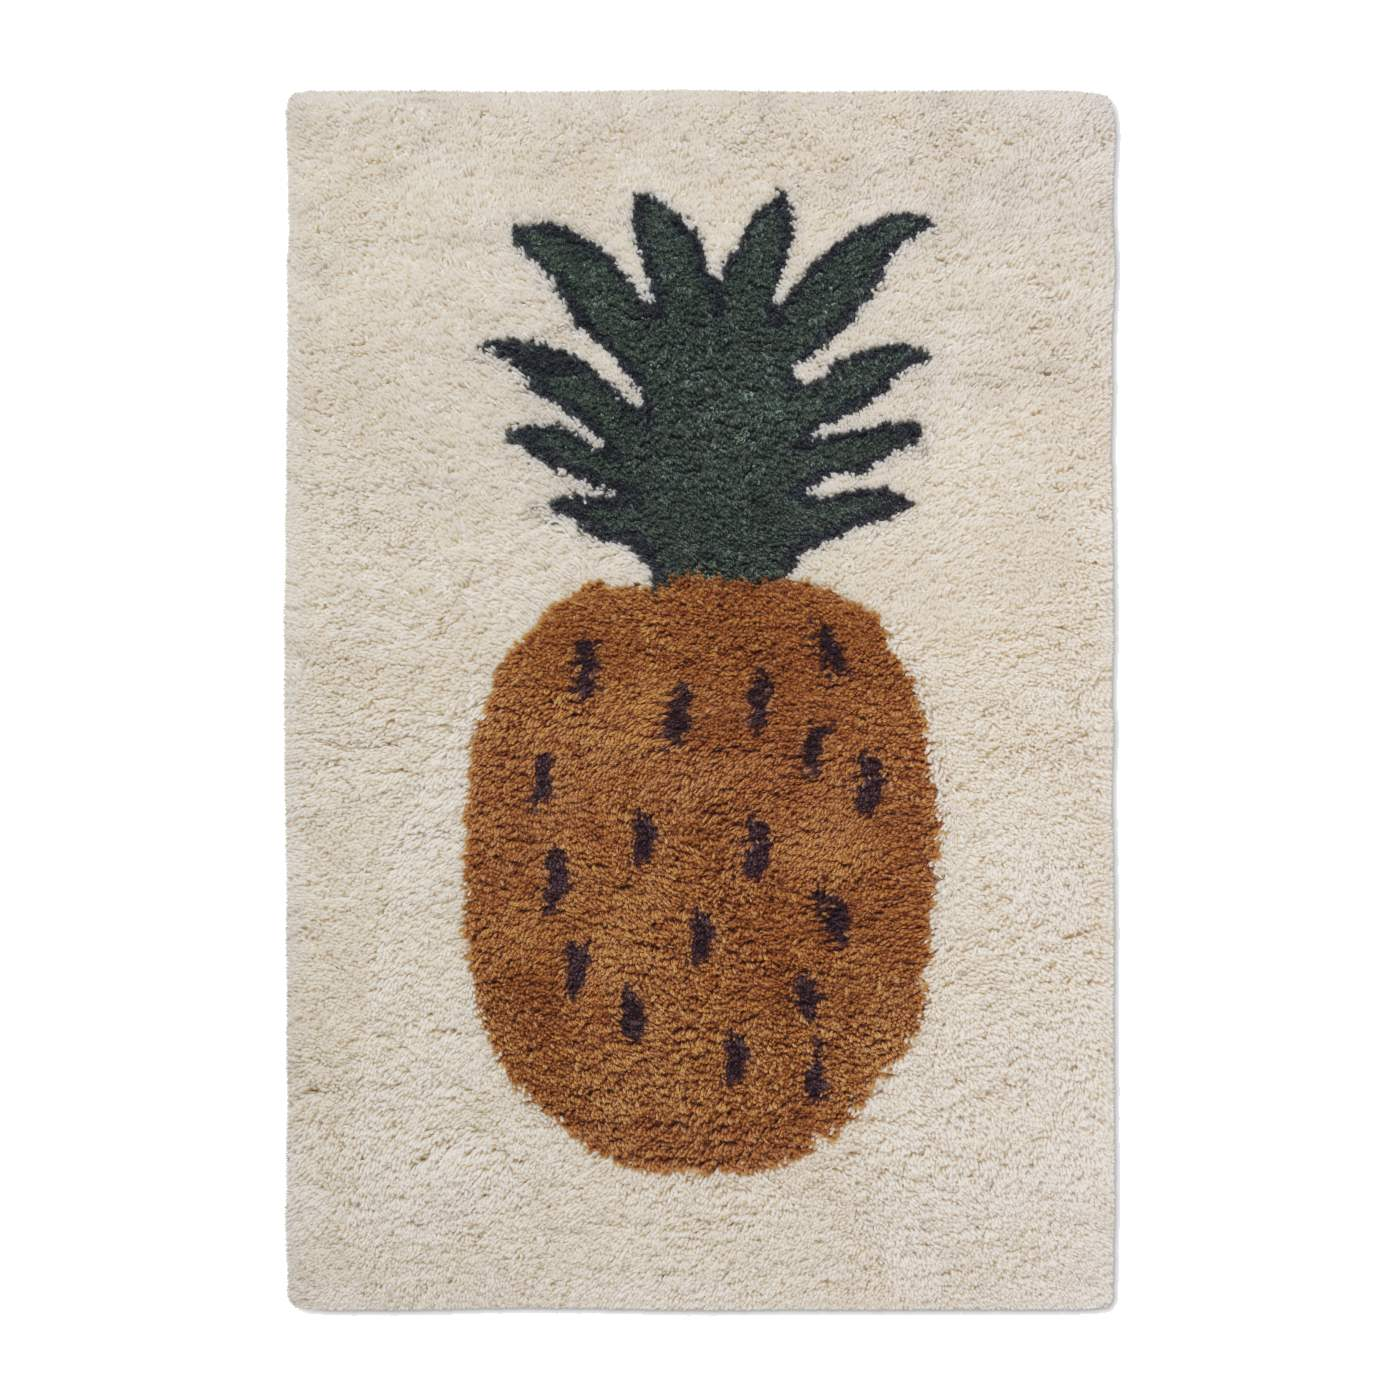 Barnmatta FRUITICANA ananas small, Ferm Living